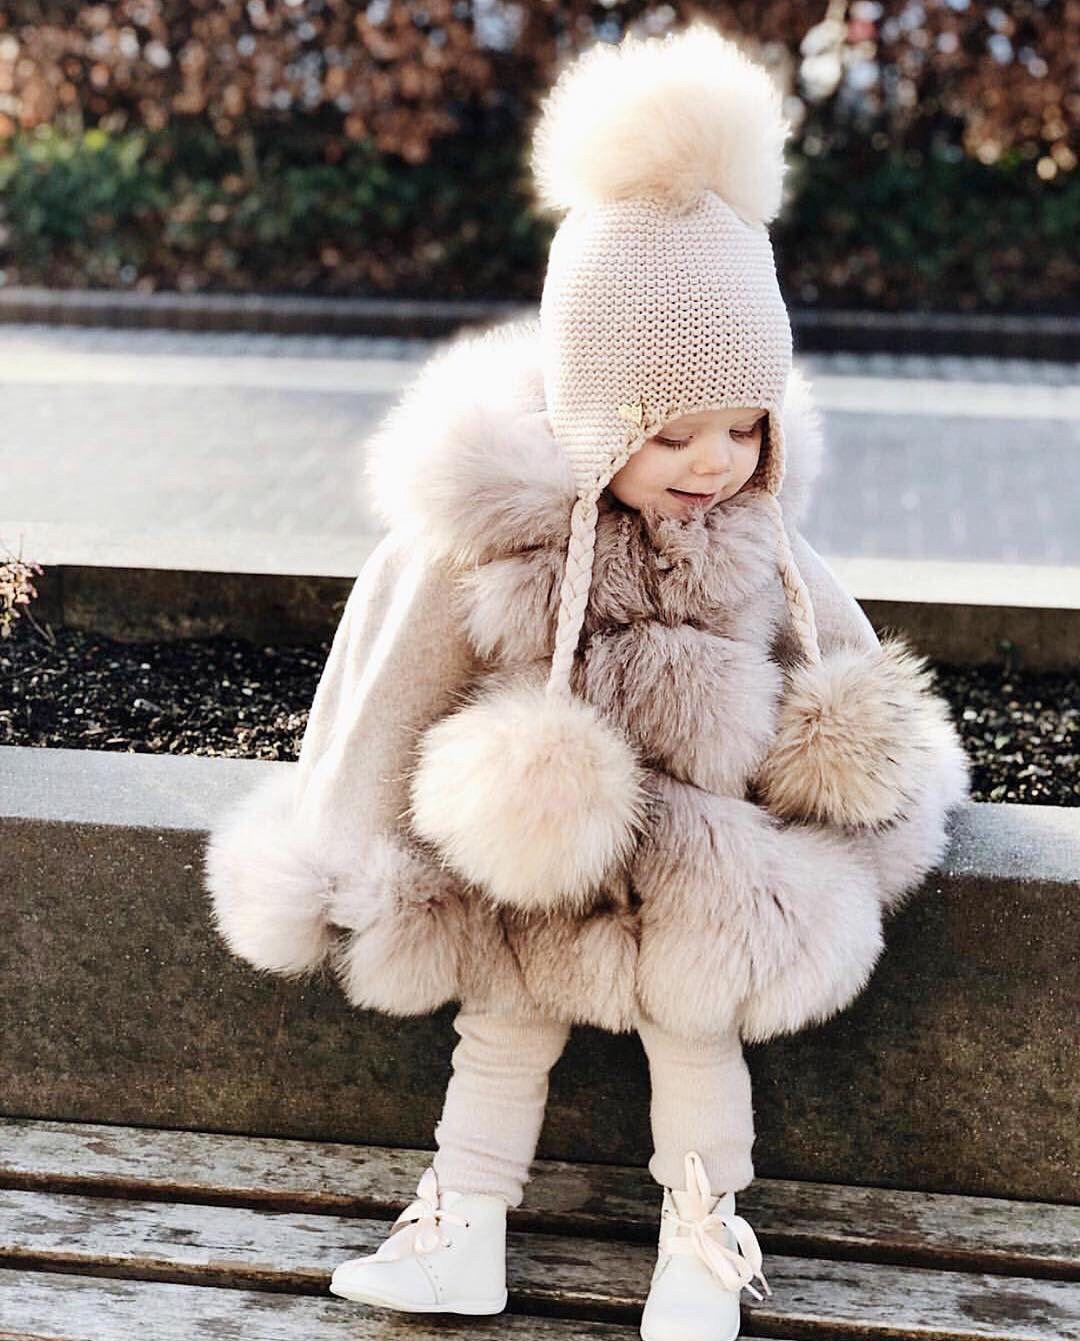 Infant Baby Girl Coat Fashion Winter Warm Hooded Cloak Jacket Princess Girls Cute Coats Kids Outerwear Children poncho Clothing